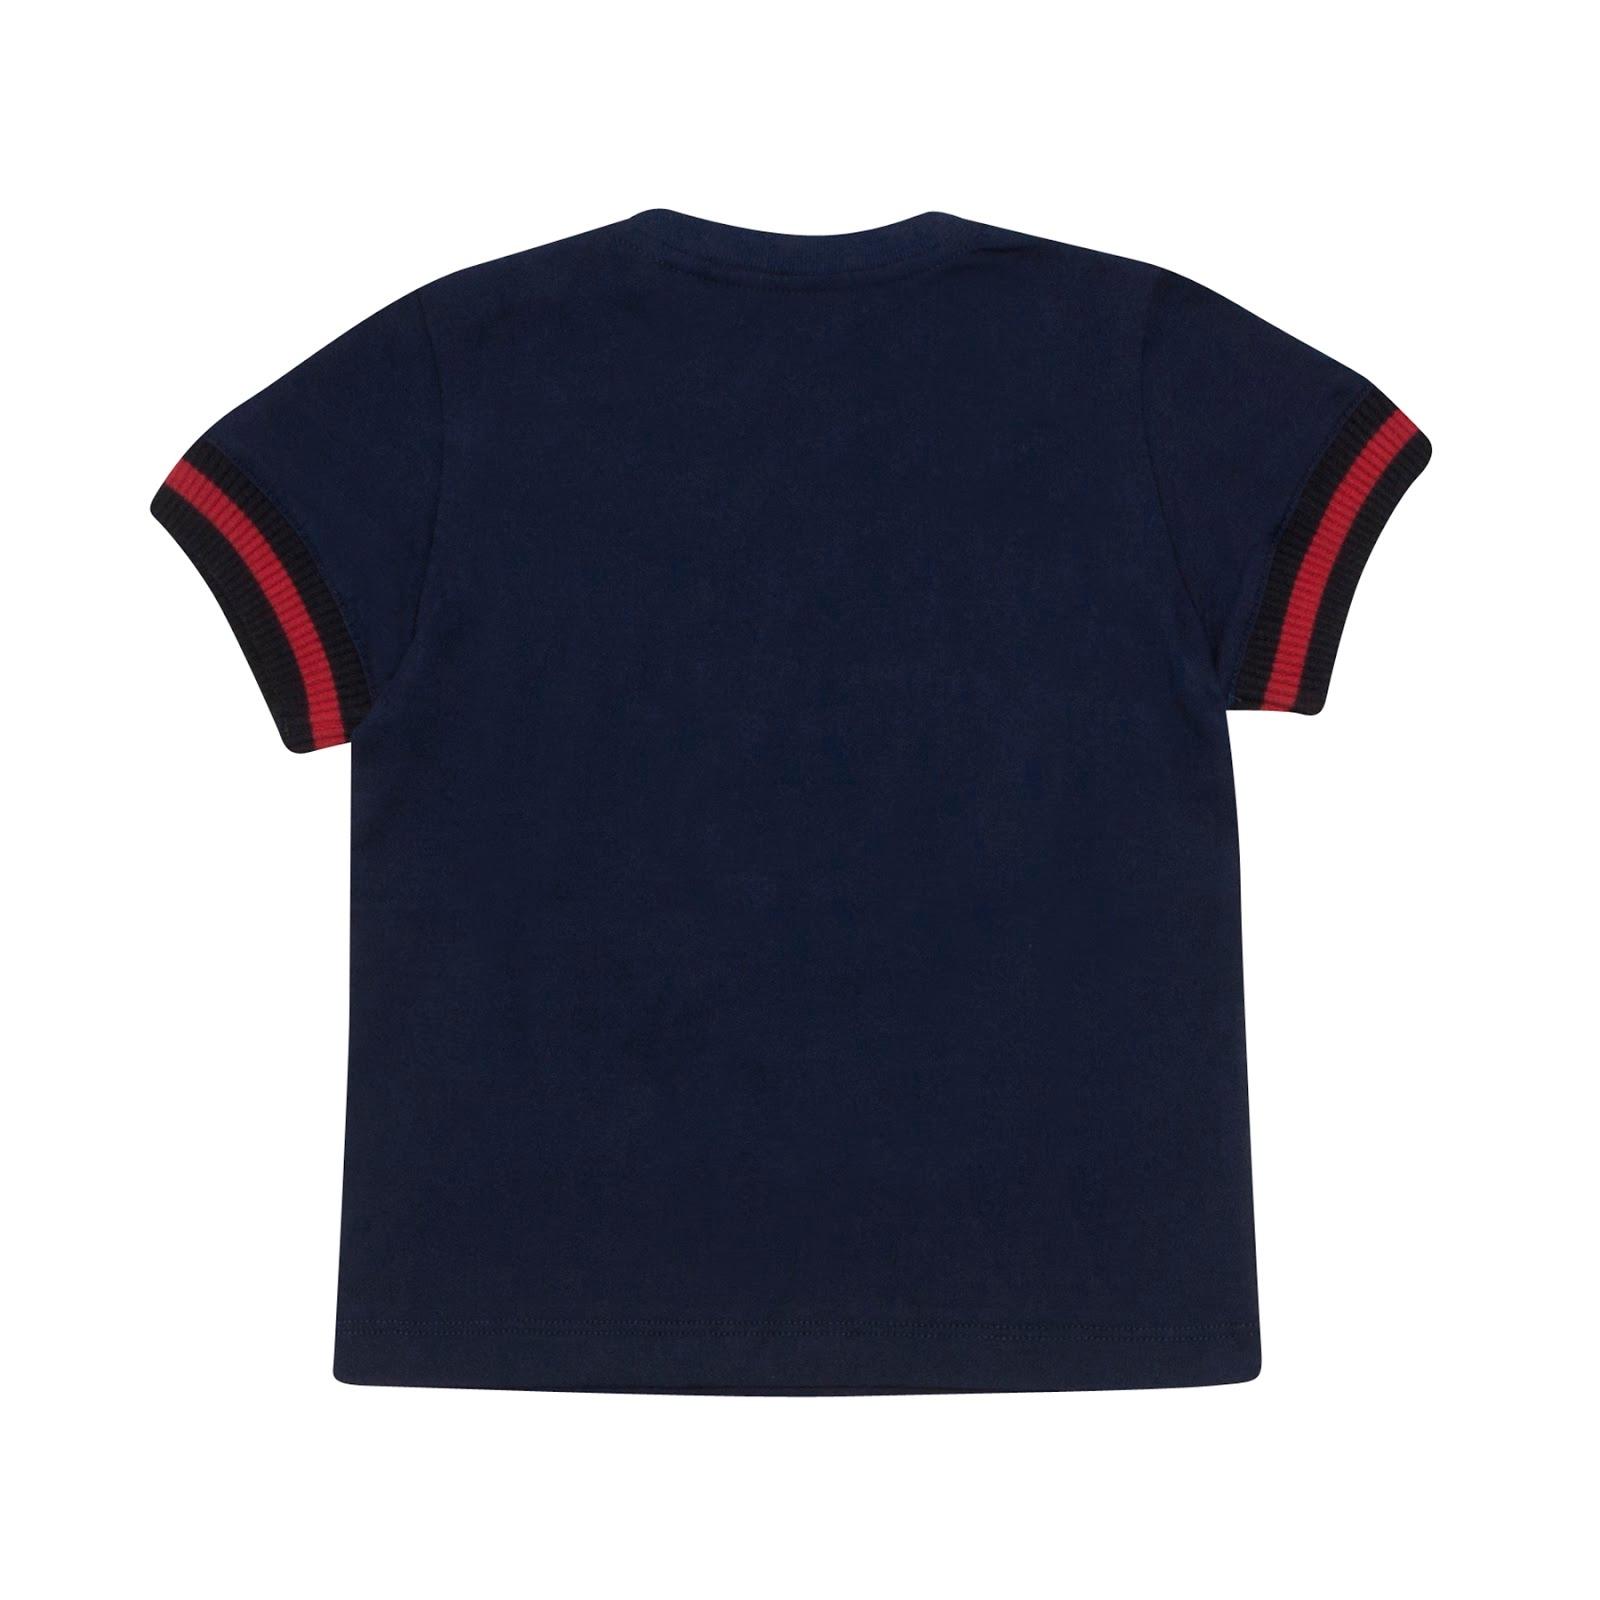 6b9ea85d6061 Designer Baby   Toddler Clothes - Babywear - Harvey Nichols